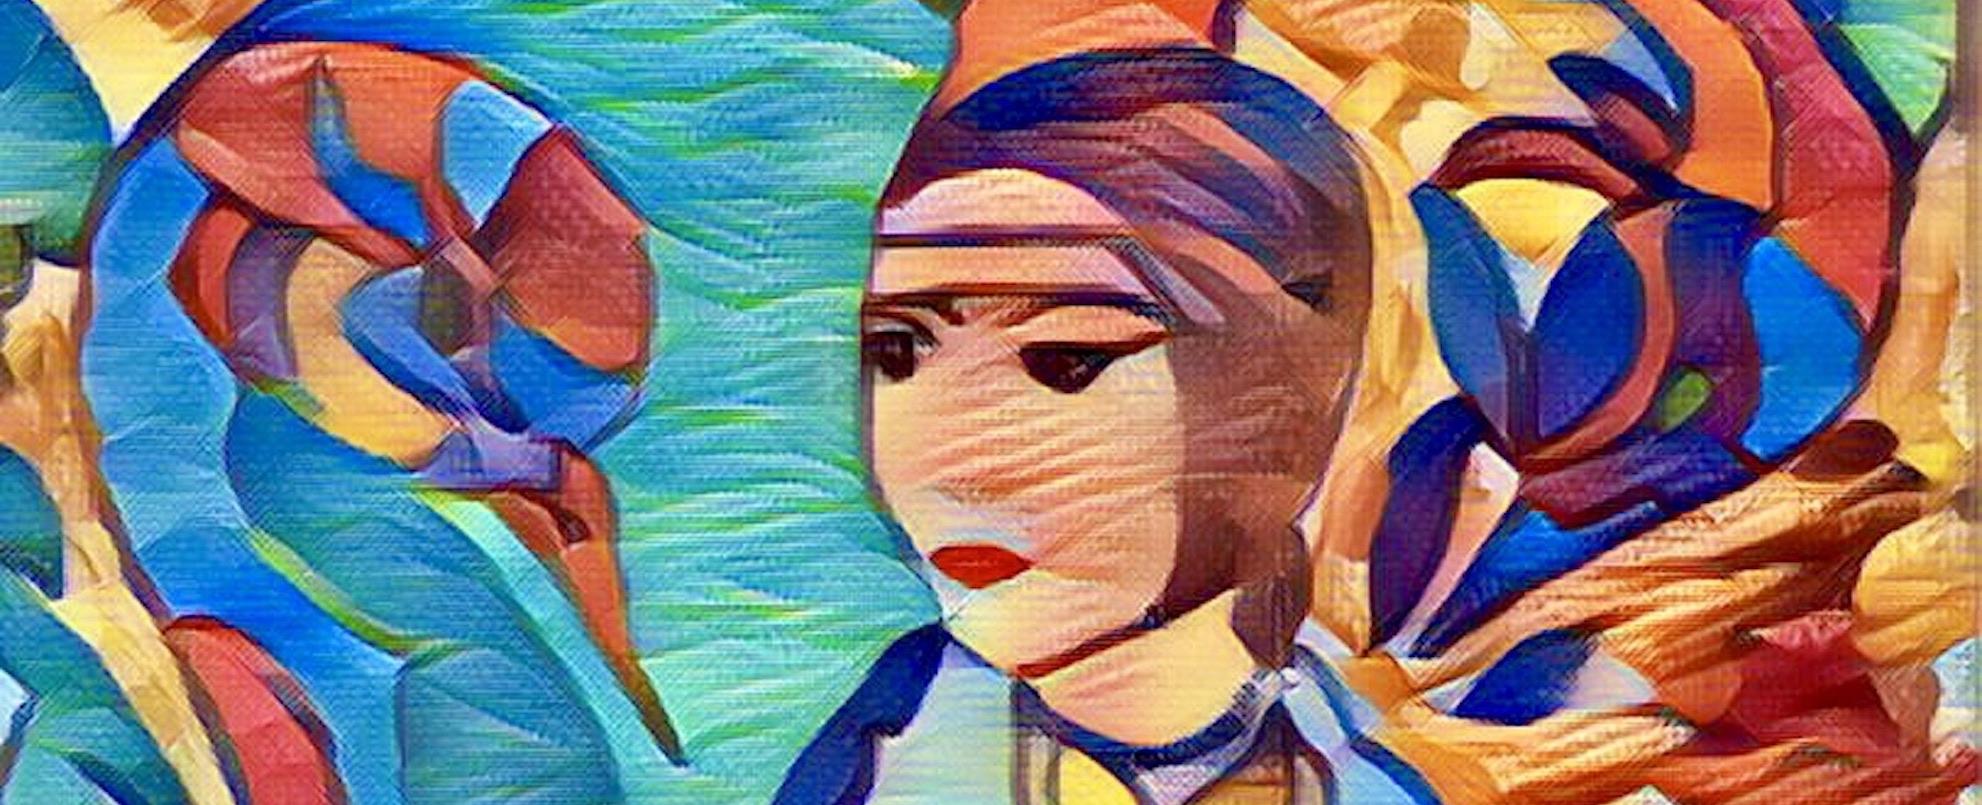 Oracle Princess Florentin